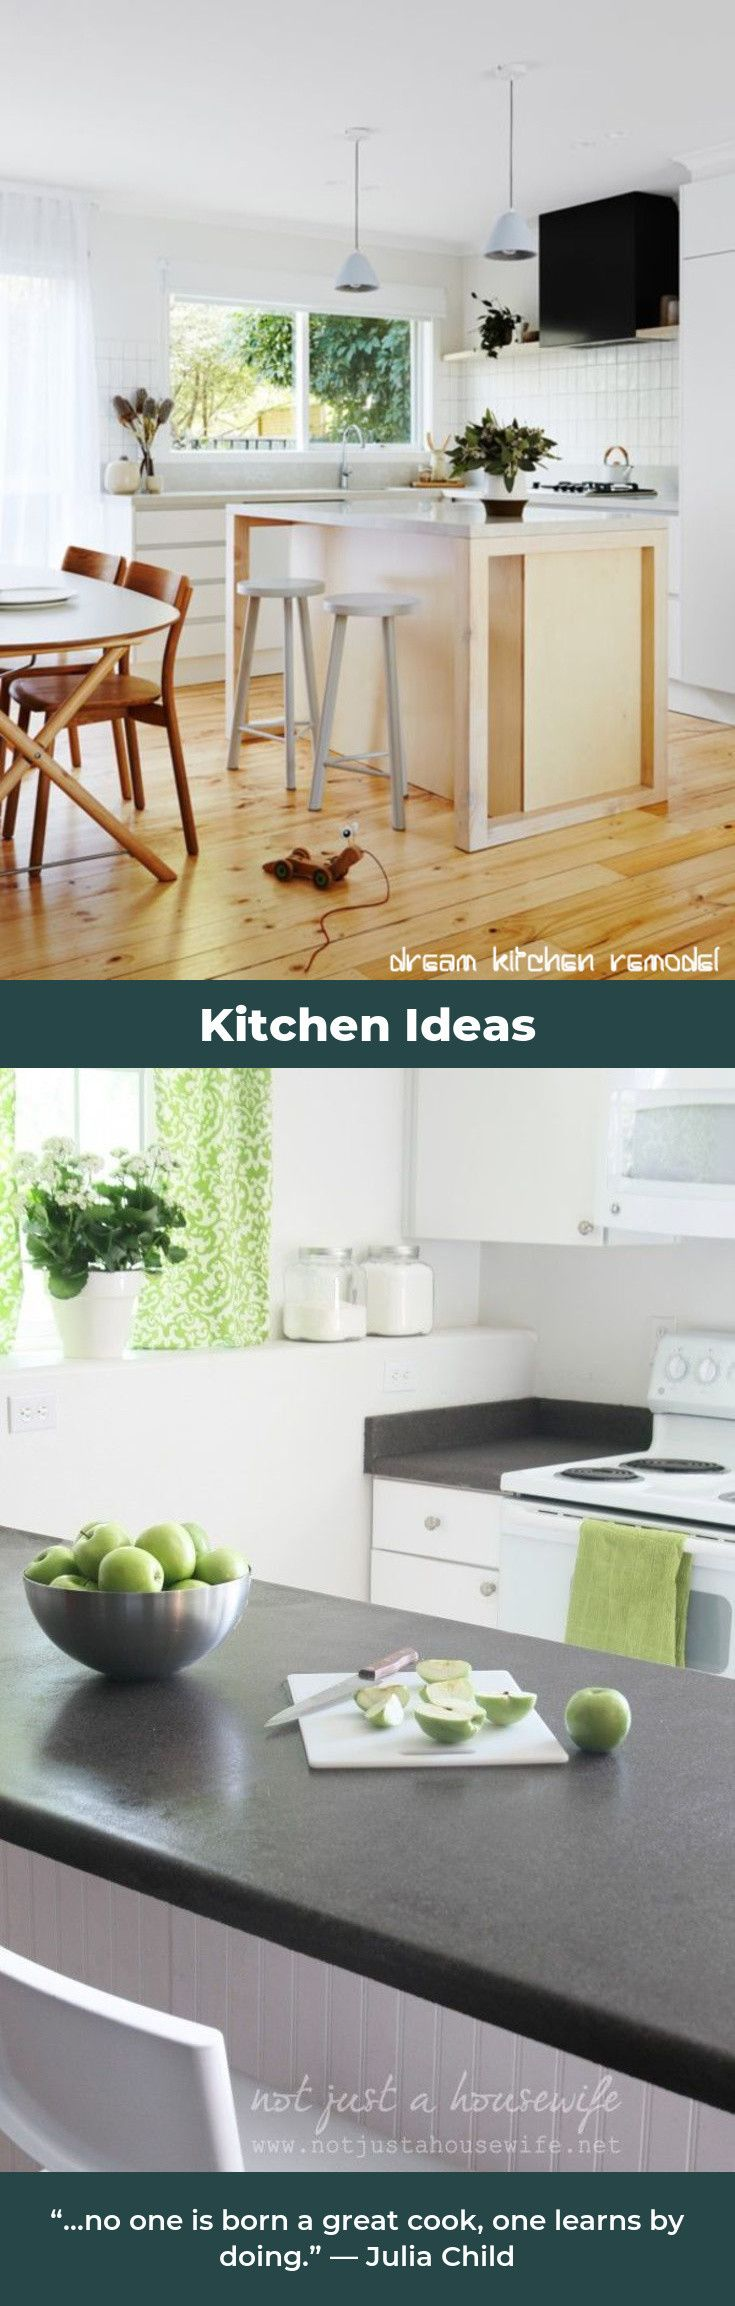 kitchen remodel with island kitchen ideas kitchen kitchendesign kitchendecor kitchenlife on kitchen island ideas cheap id=84446